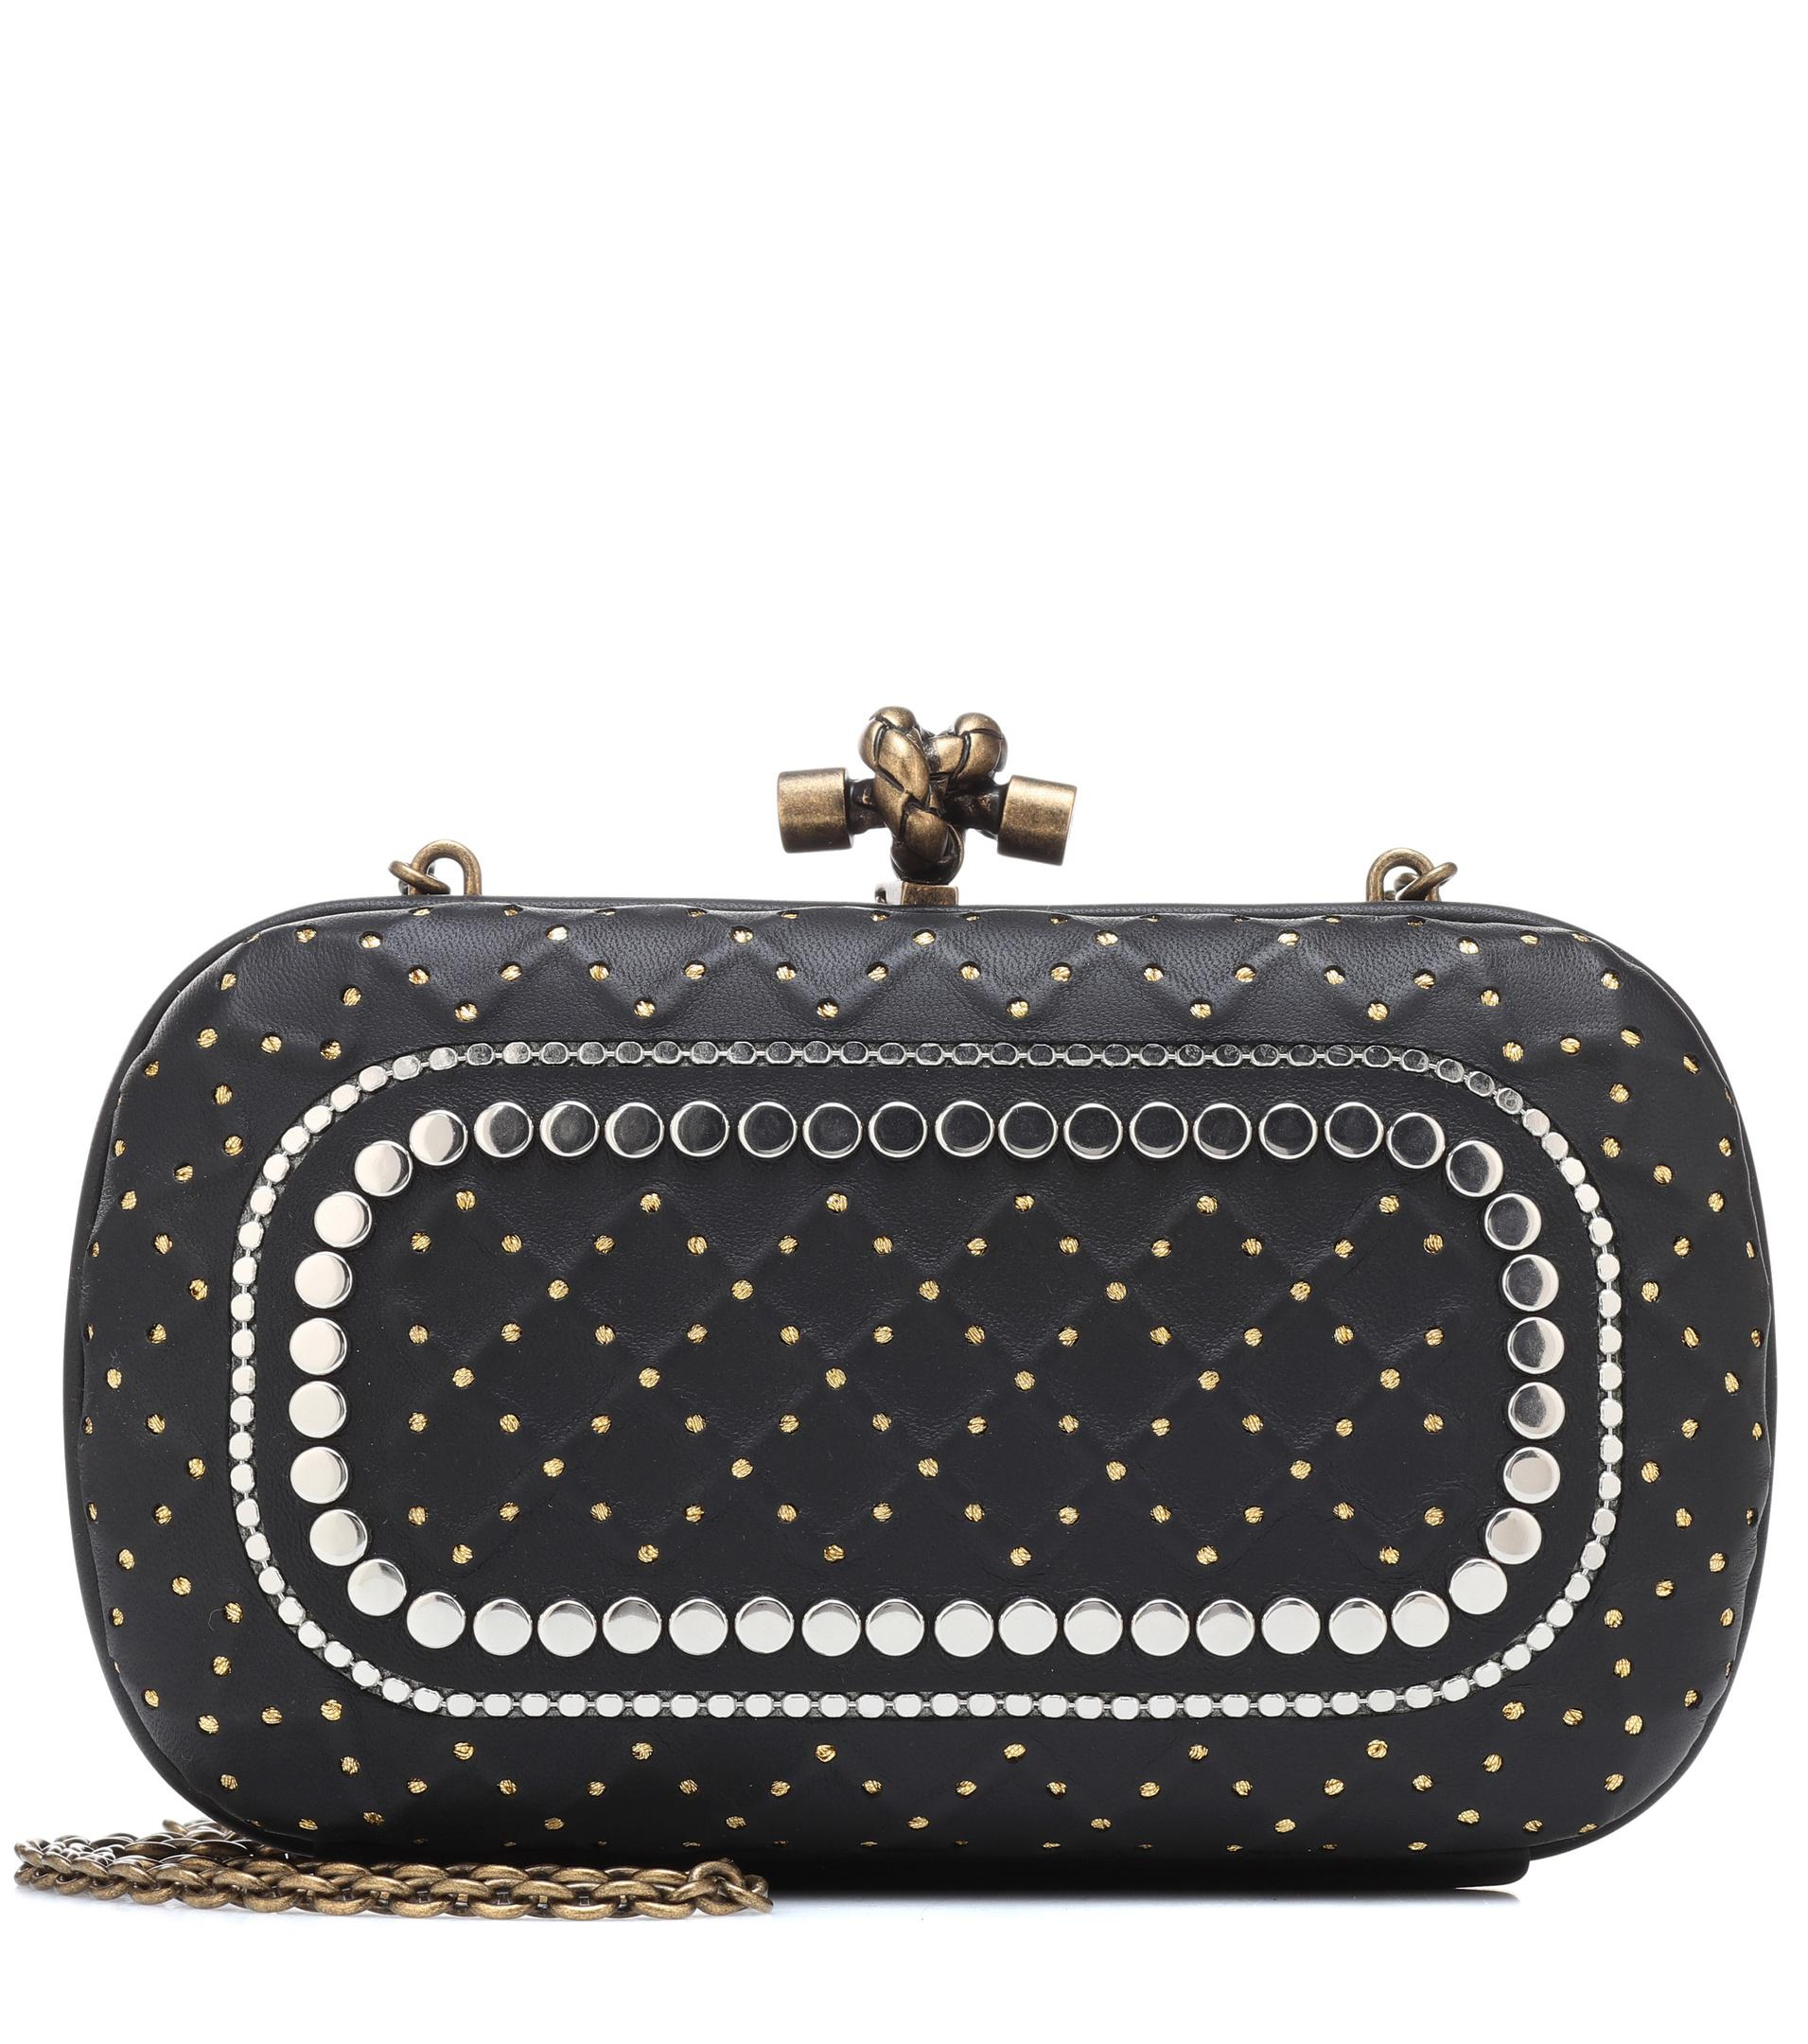 Bottega Veneta Snakeskin Studded Knot Clutch Bag in Black - Save ... a24dfd36ad031